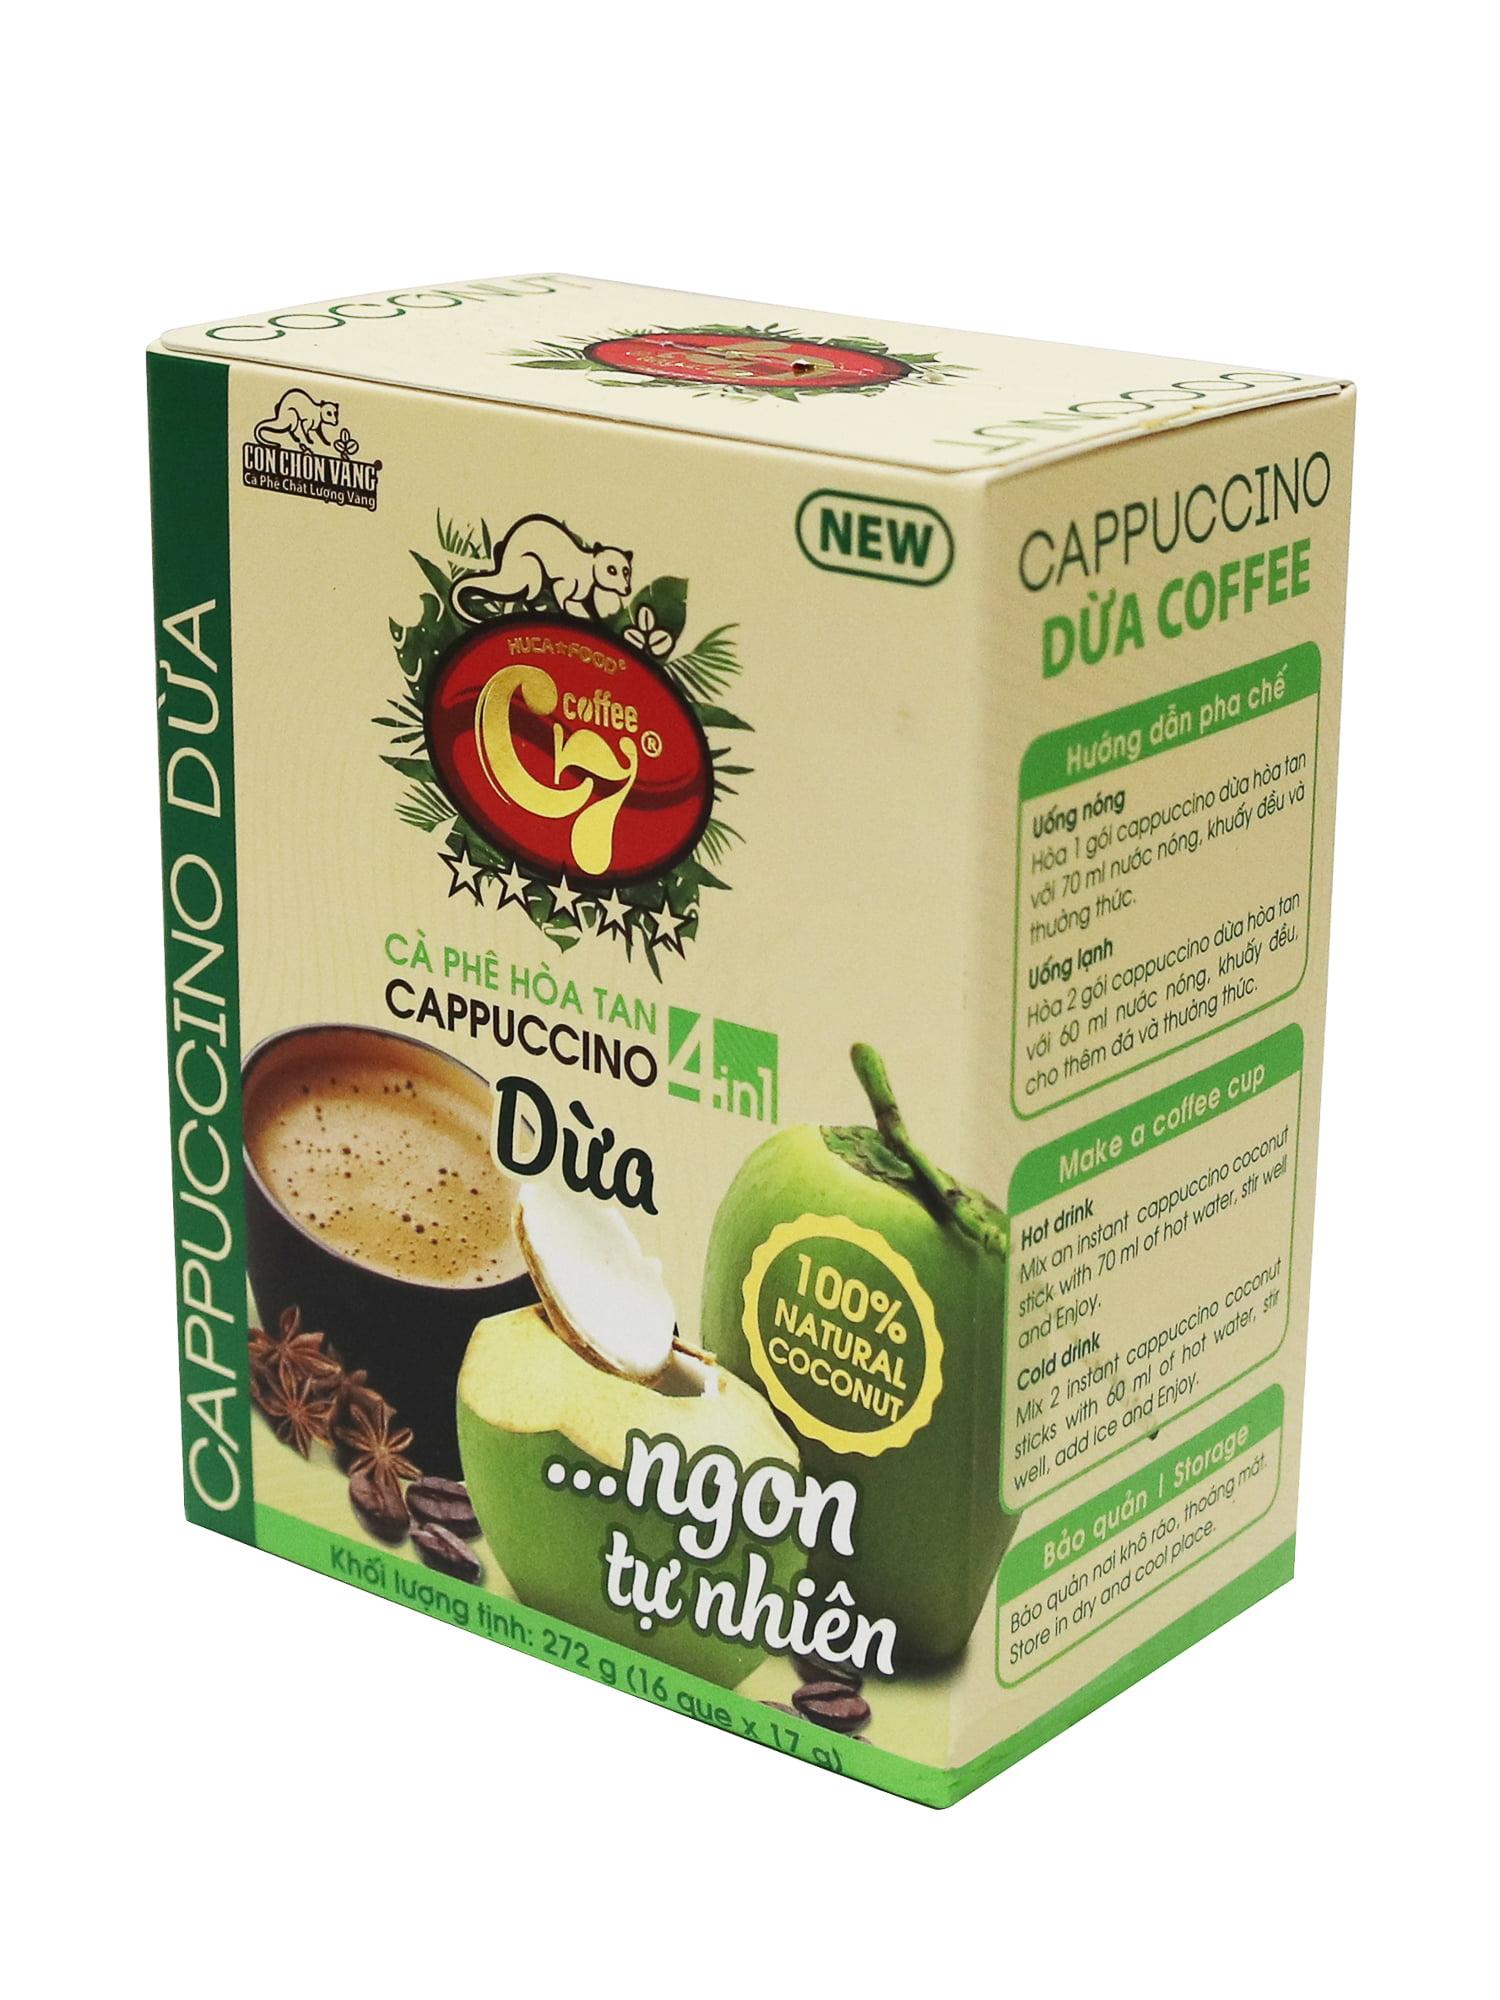 Cà phê dừa hòa tan 4in1 cappuccino - Huca Food, instant cofee, 4in1 instant coffee